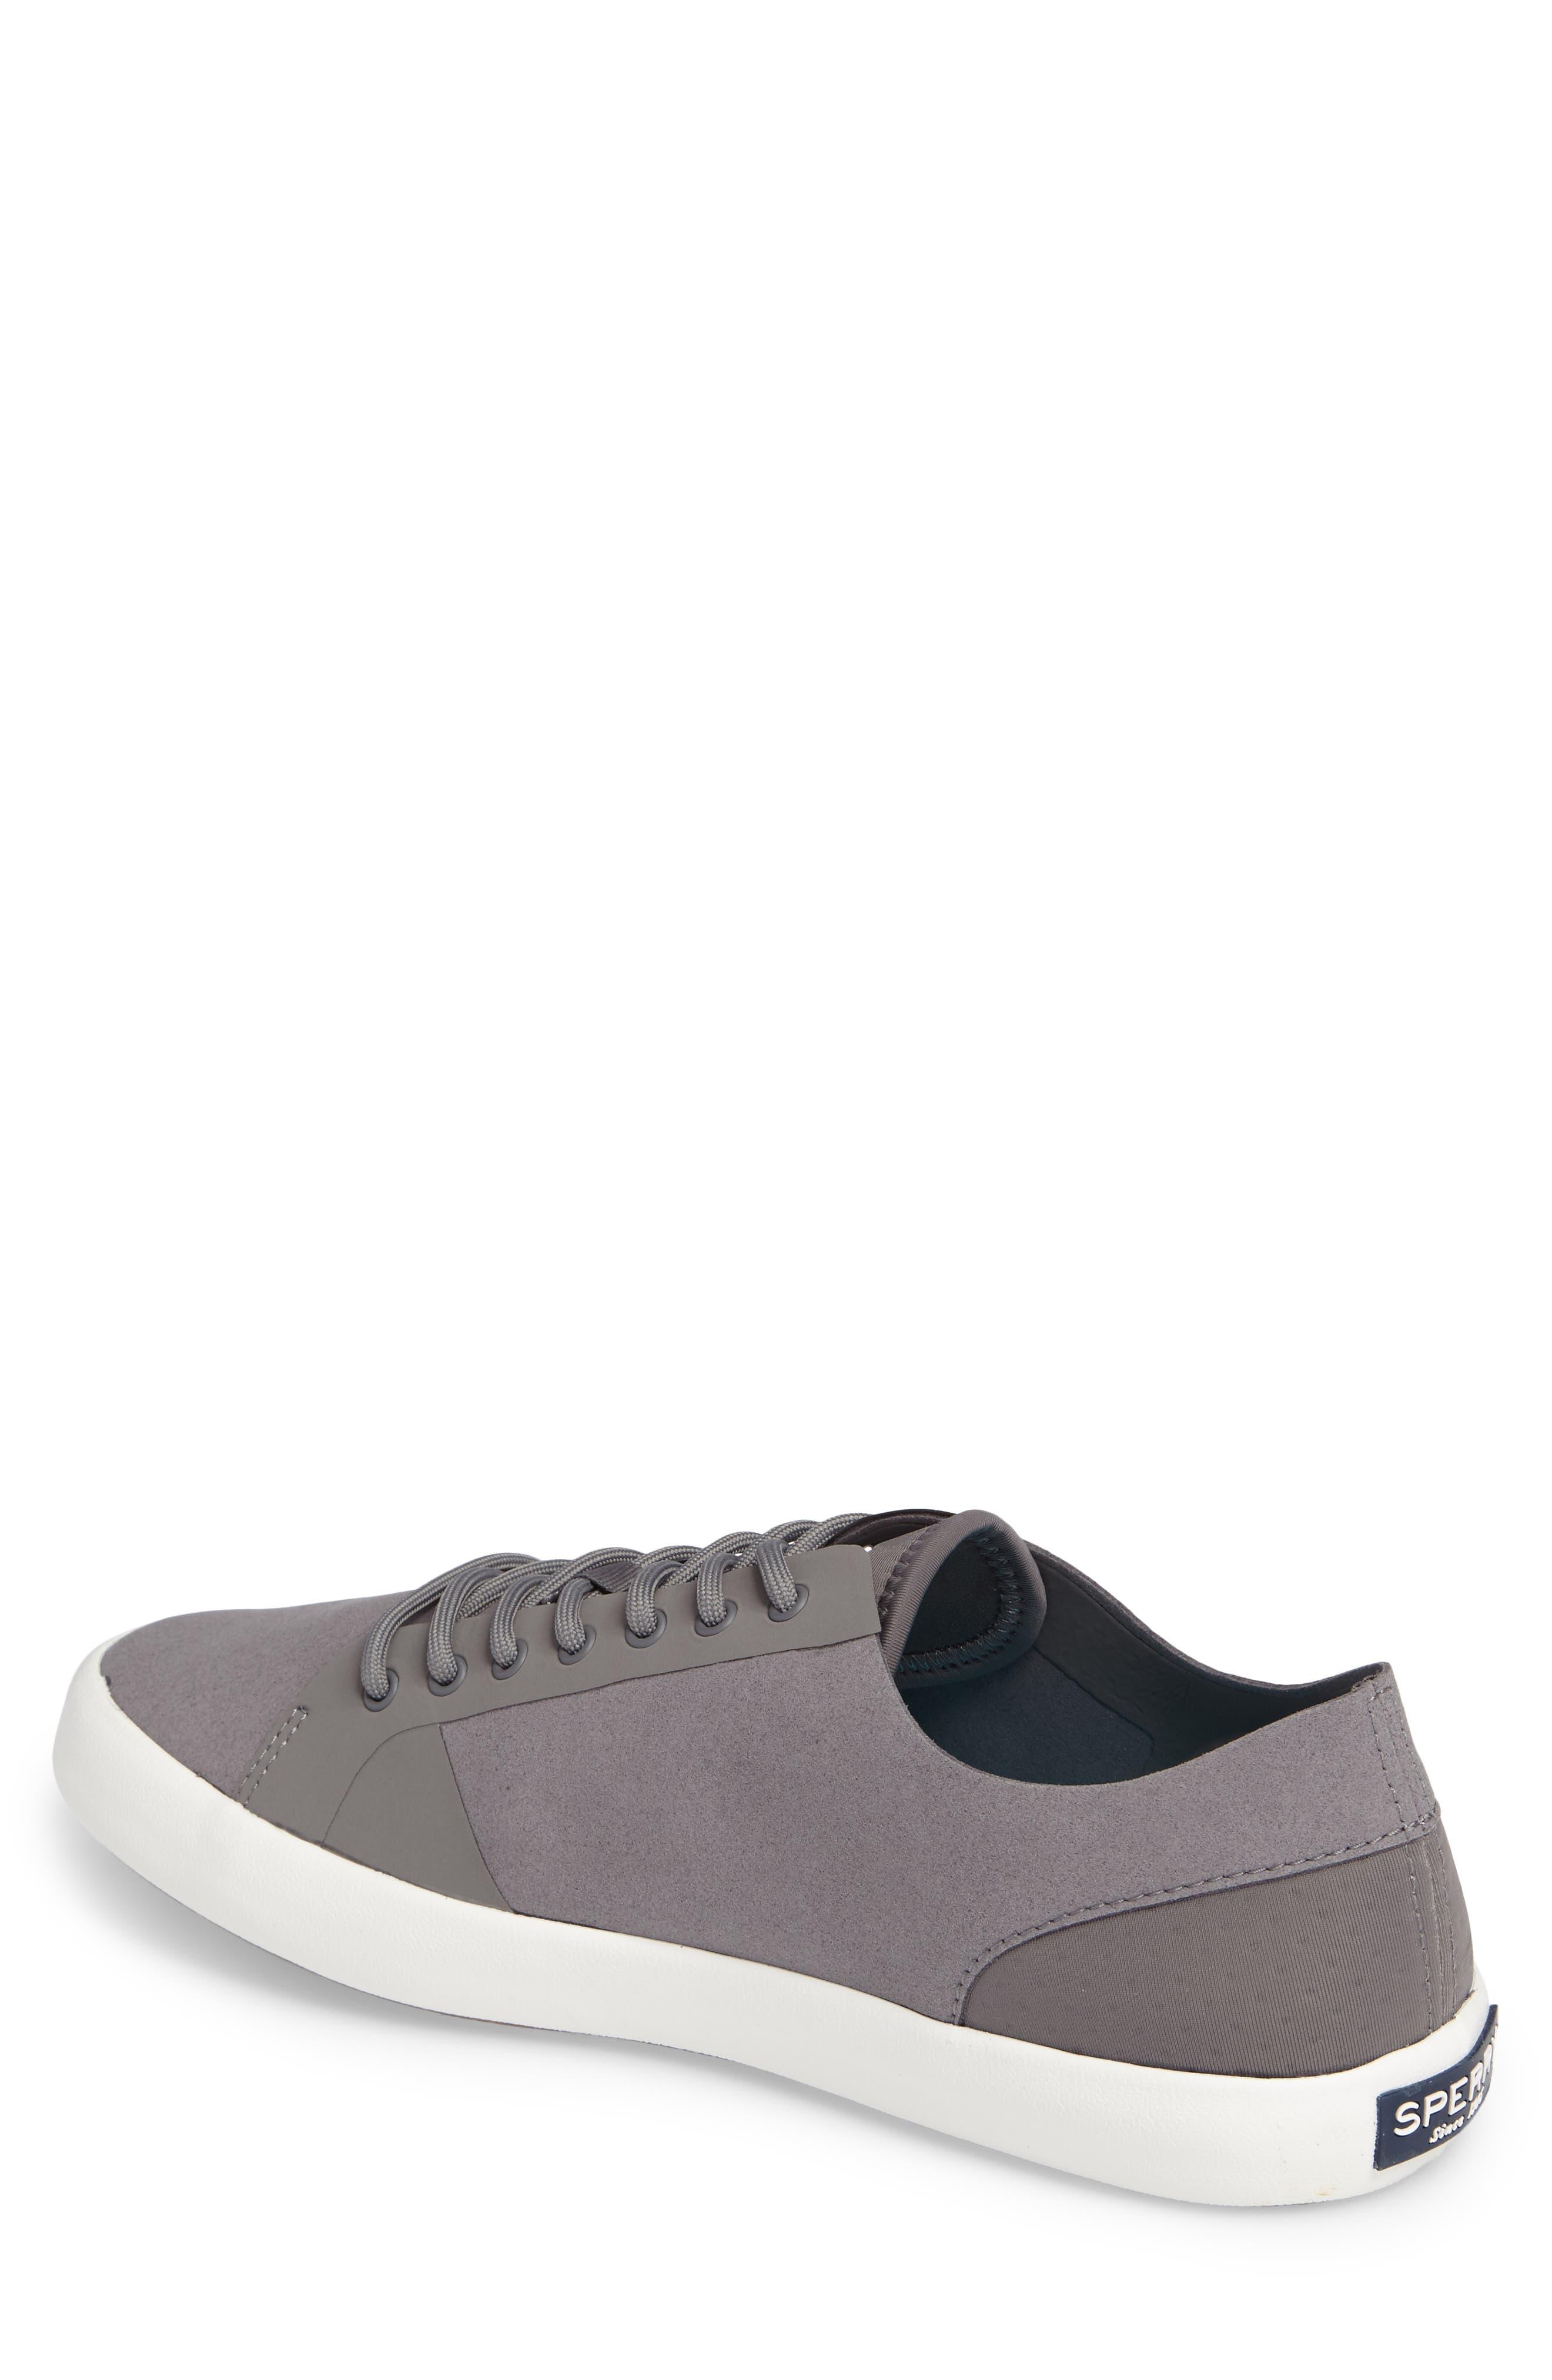 Flex Deck LTT Sneaker,                             Alternate thumbnail 2, color,                             Grey